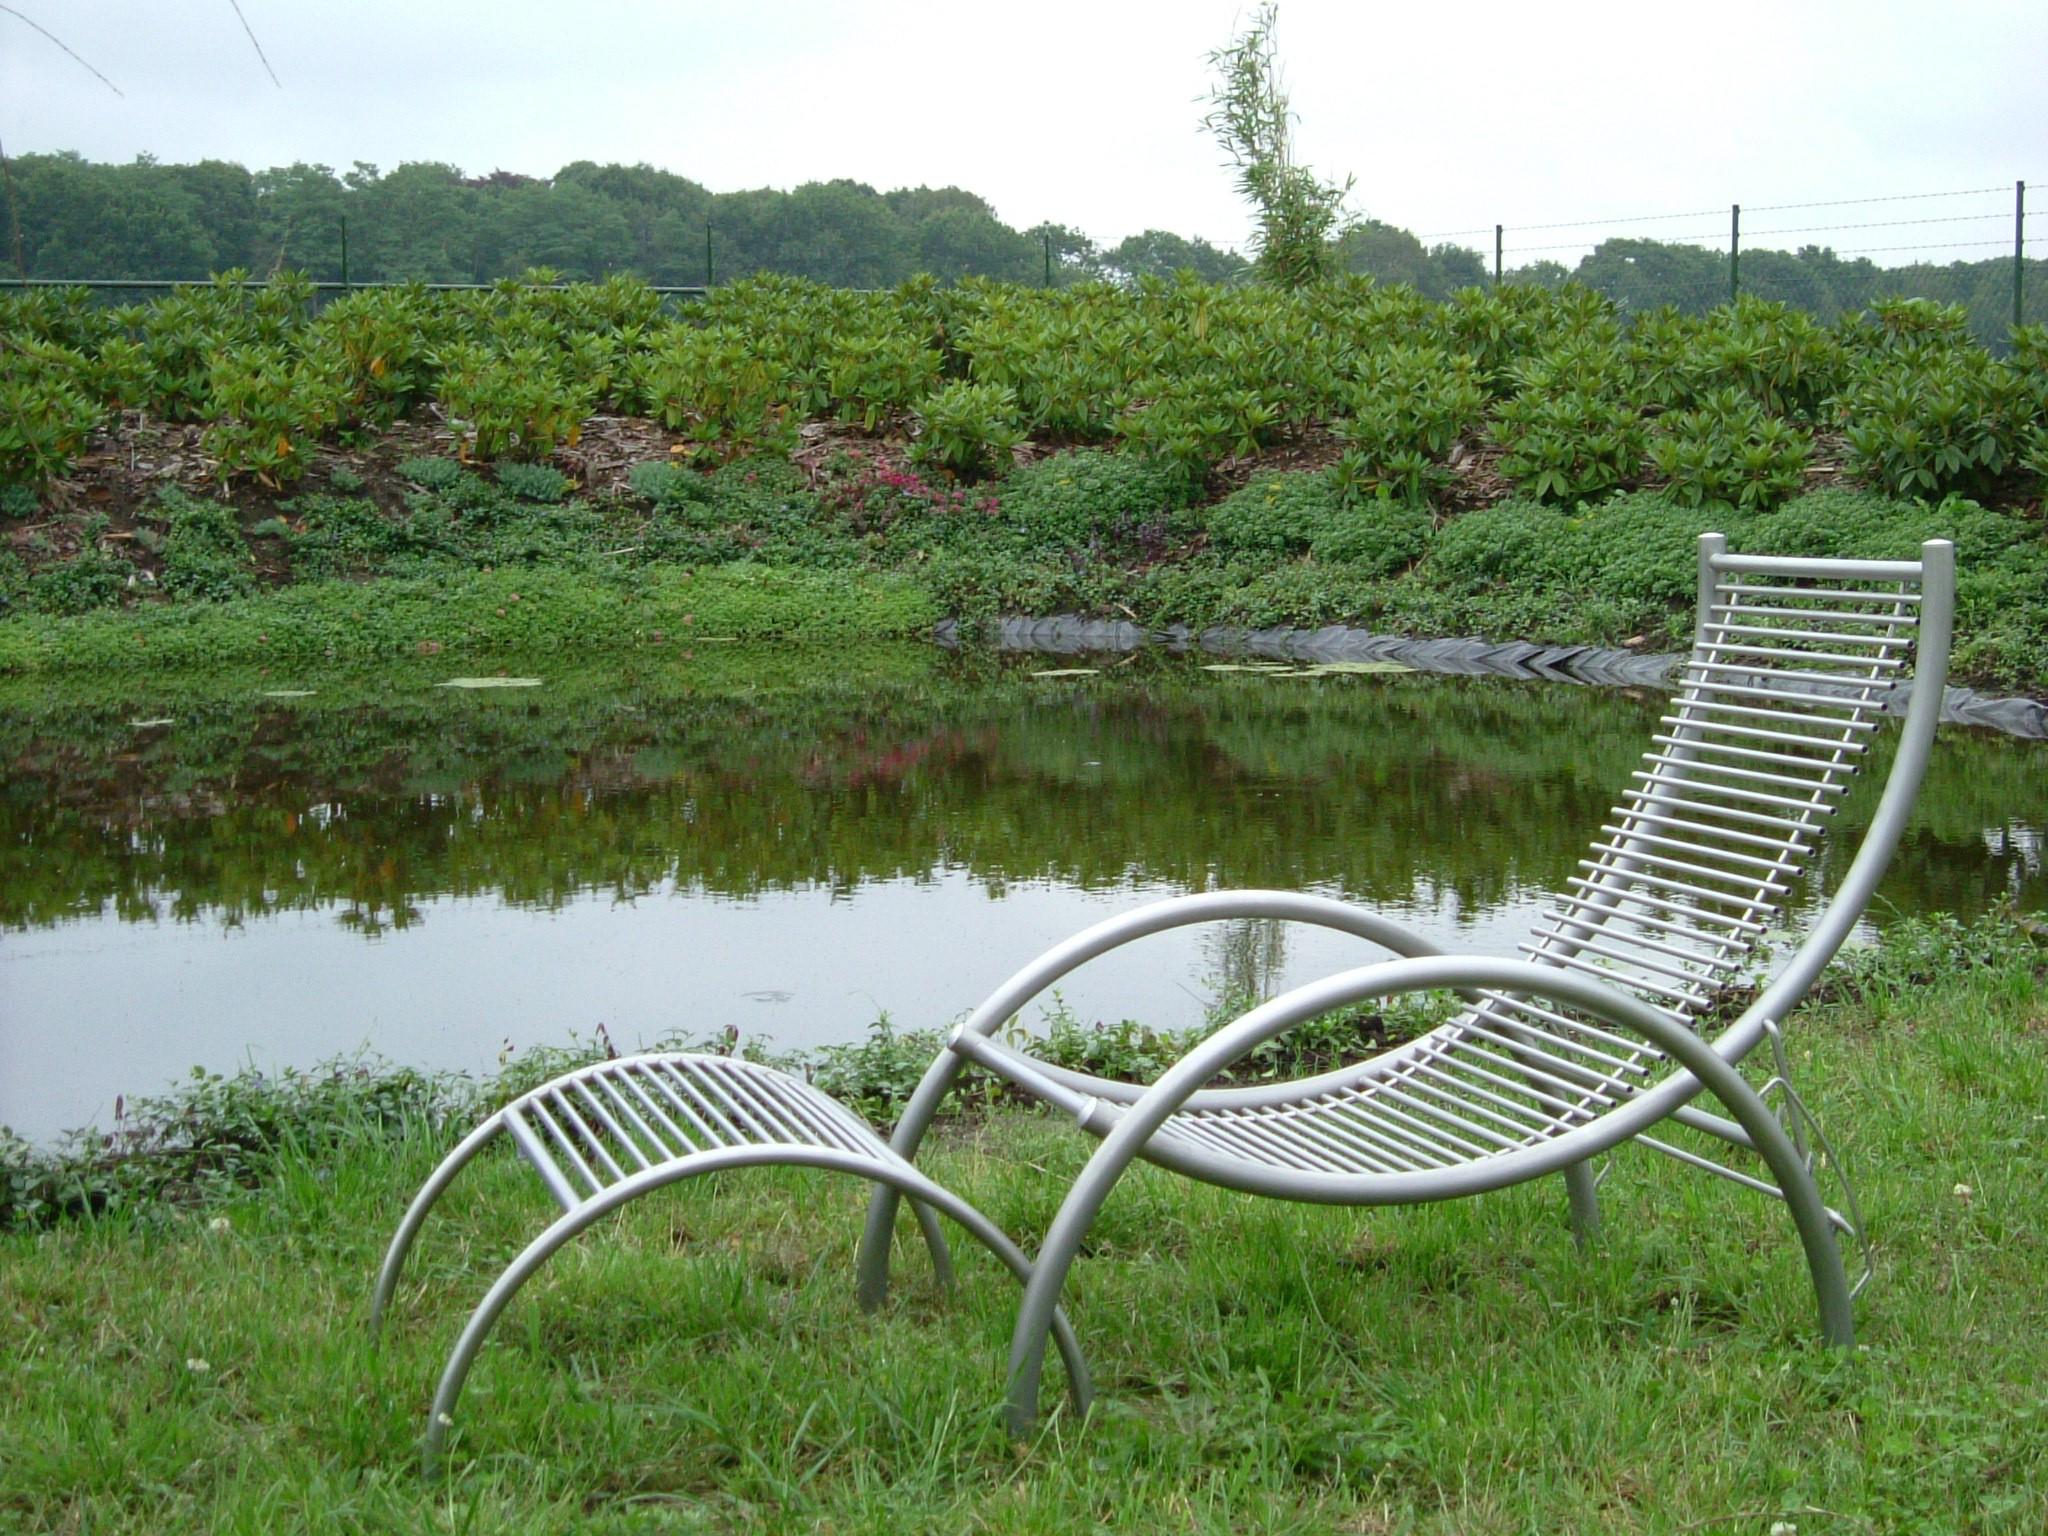 Ligstoel rieleks gardinox bv for Ligstoel buiten